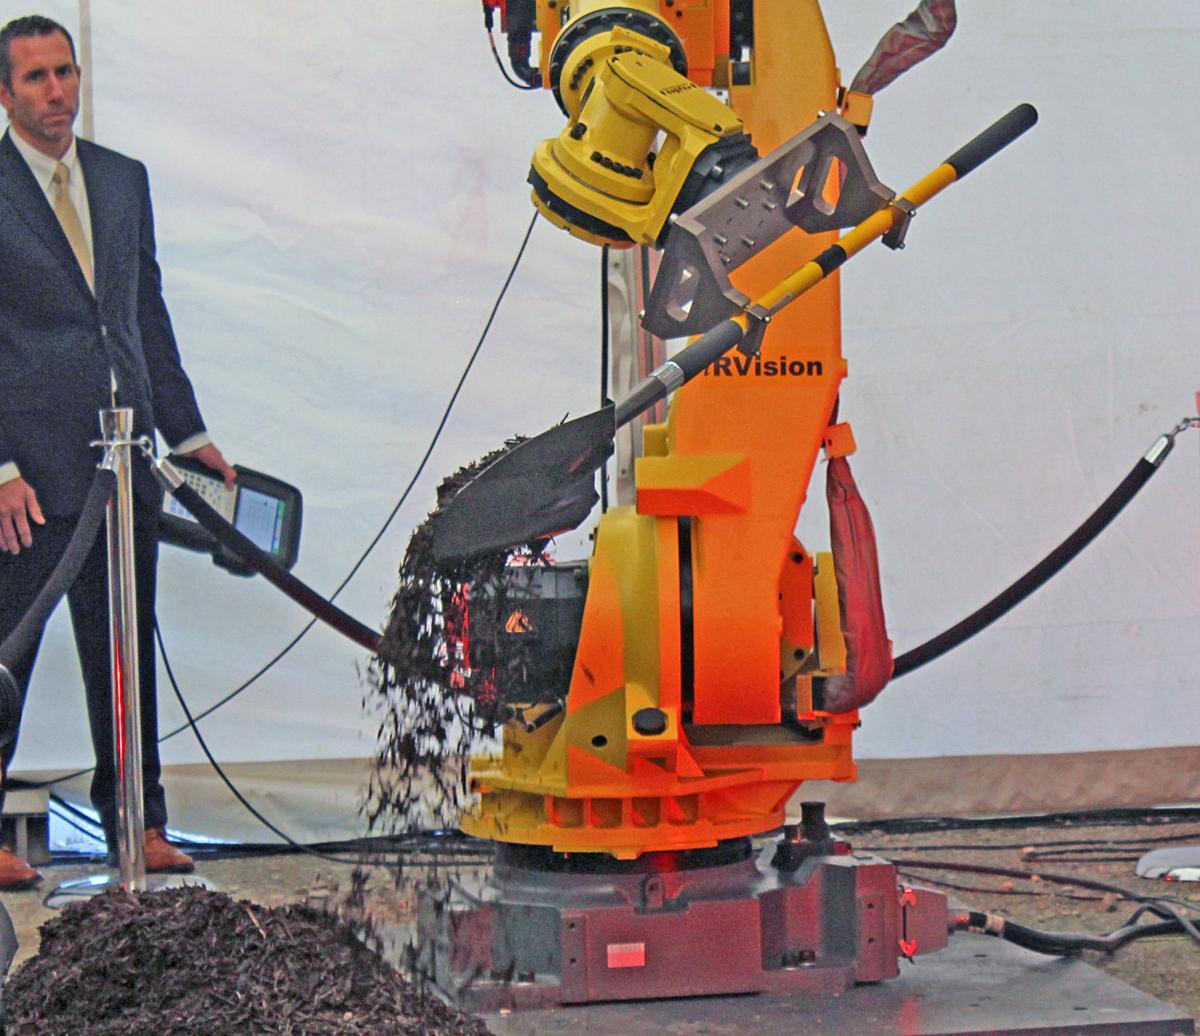 Groundbreaking robot